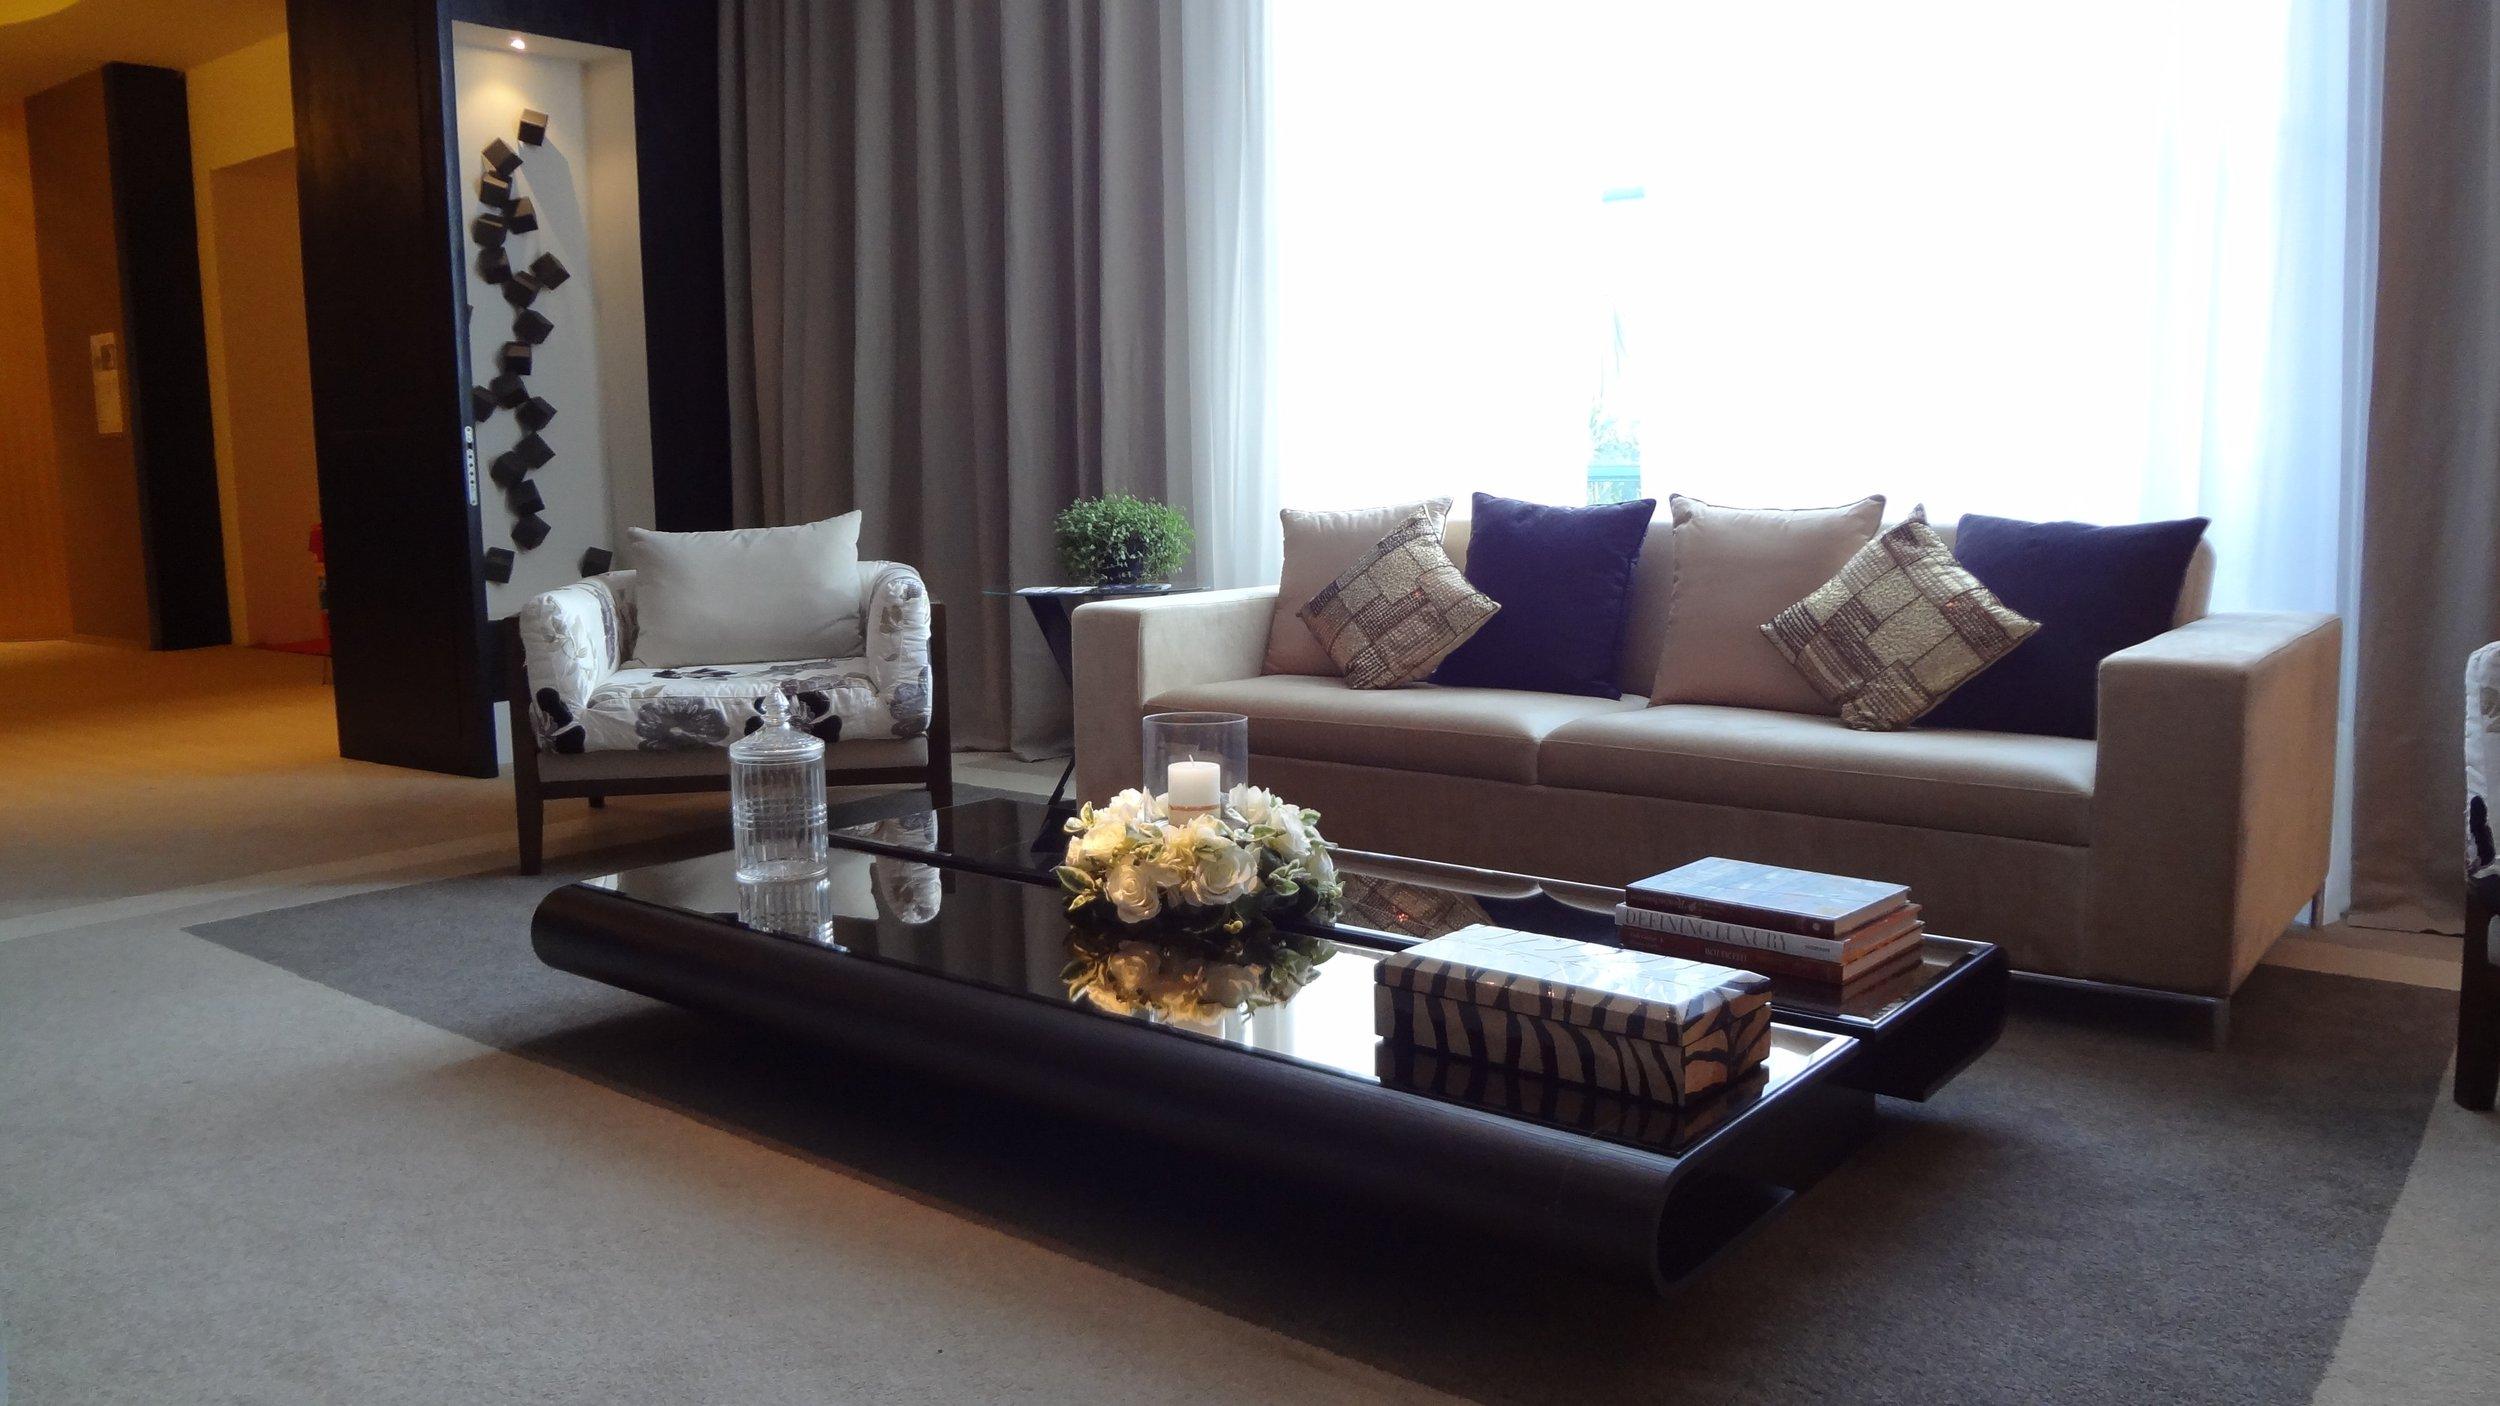 apartment-chair-comfort-276700.jpg